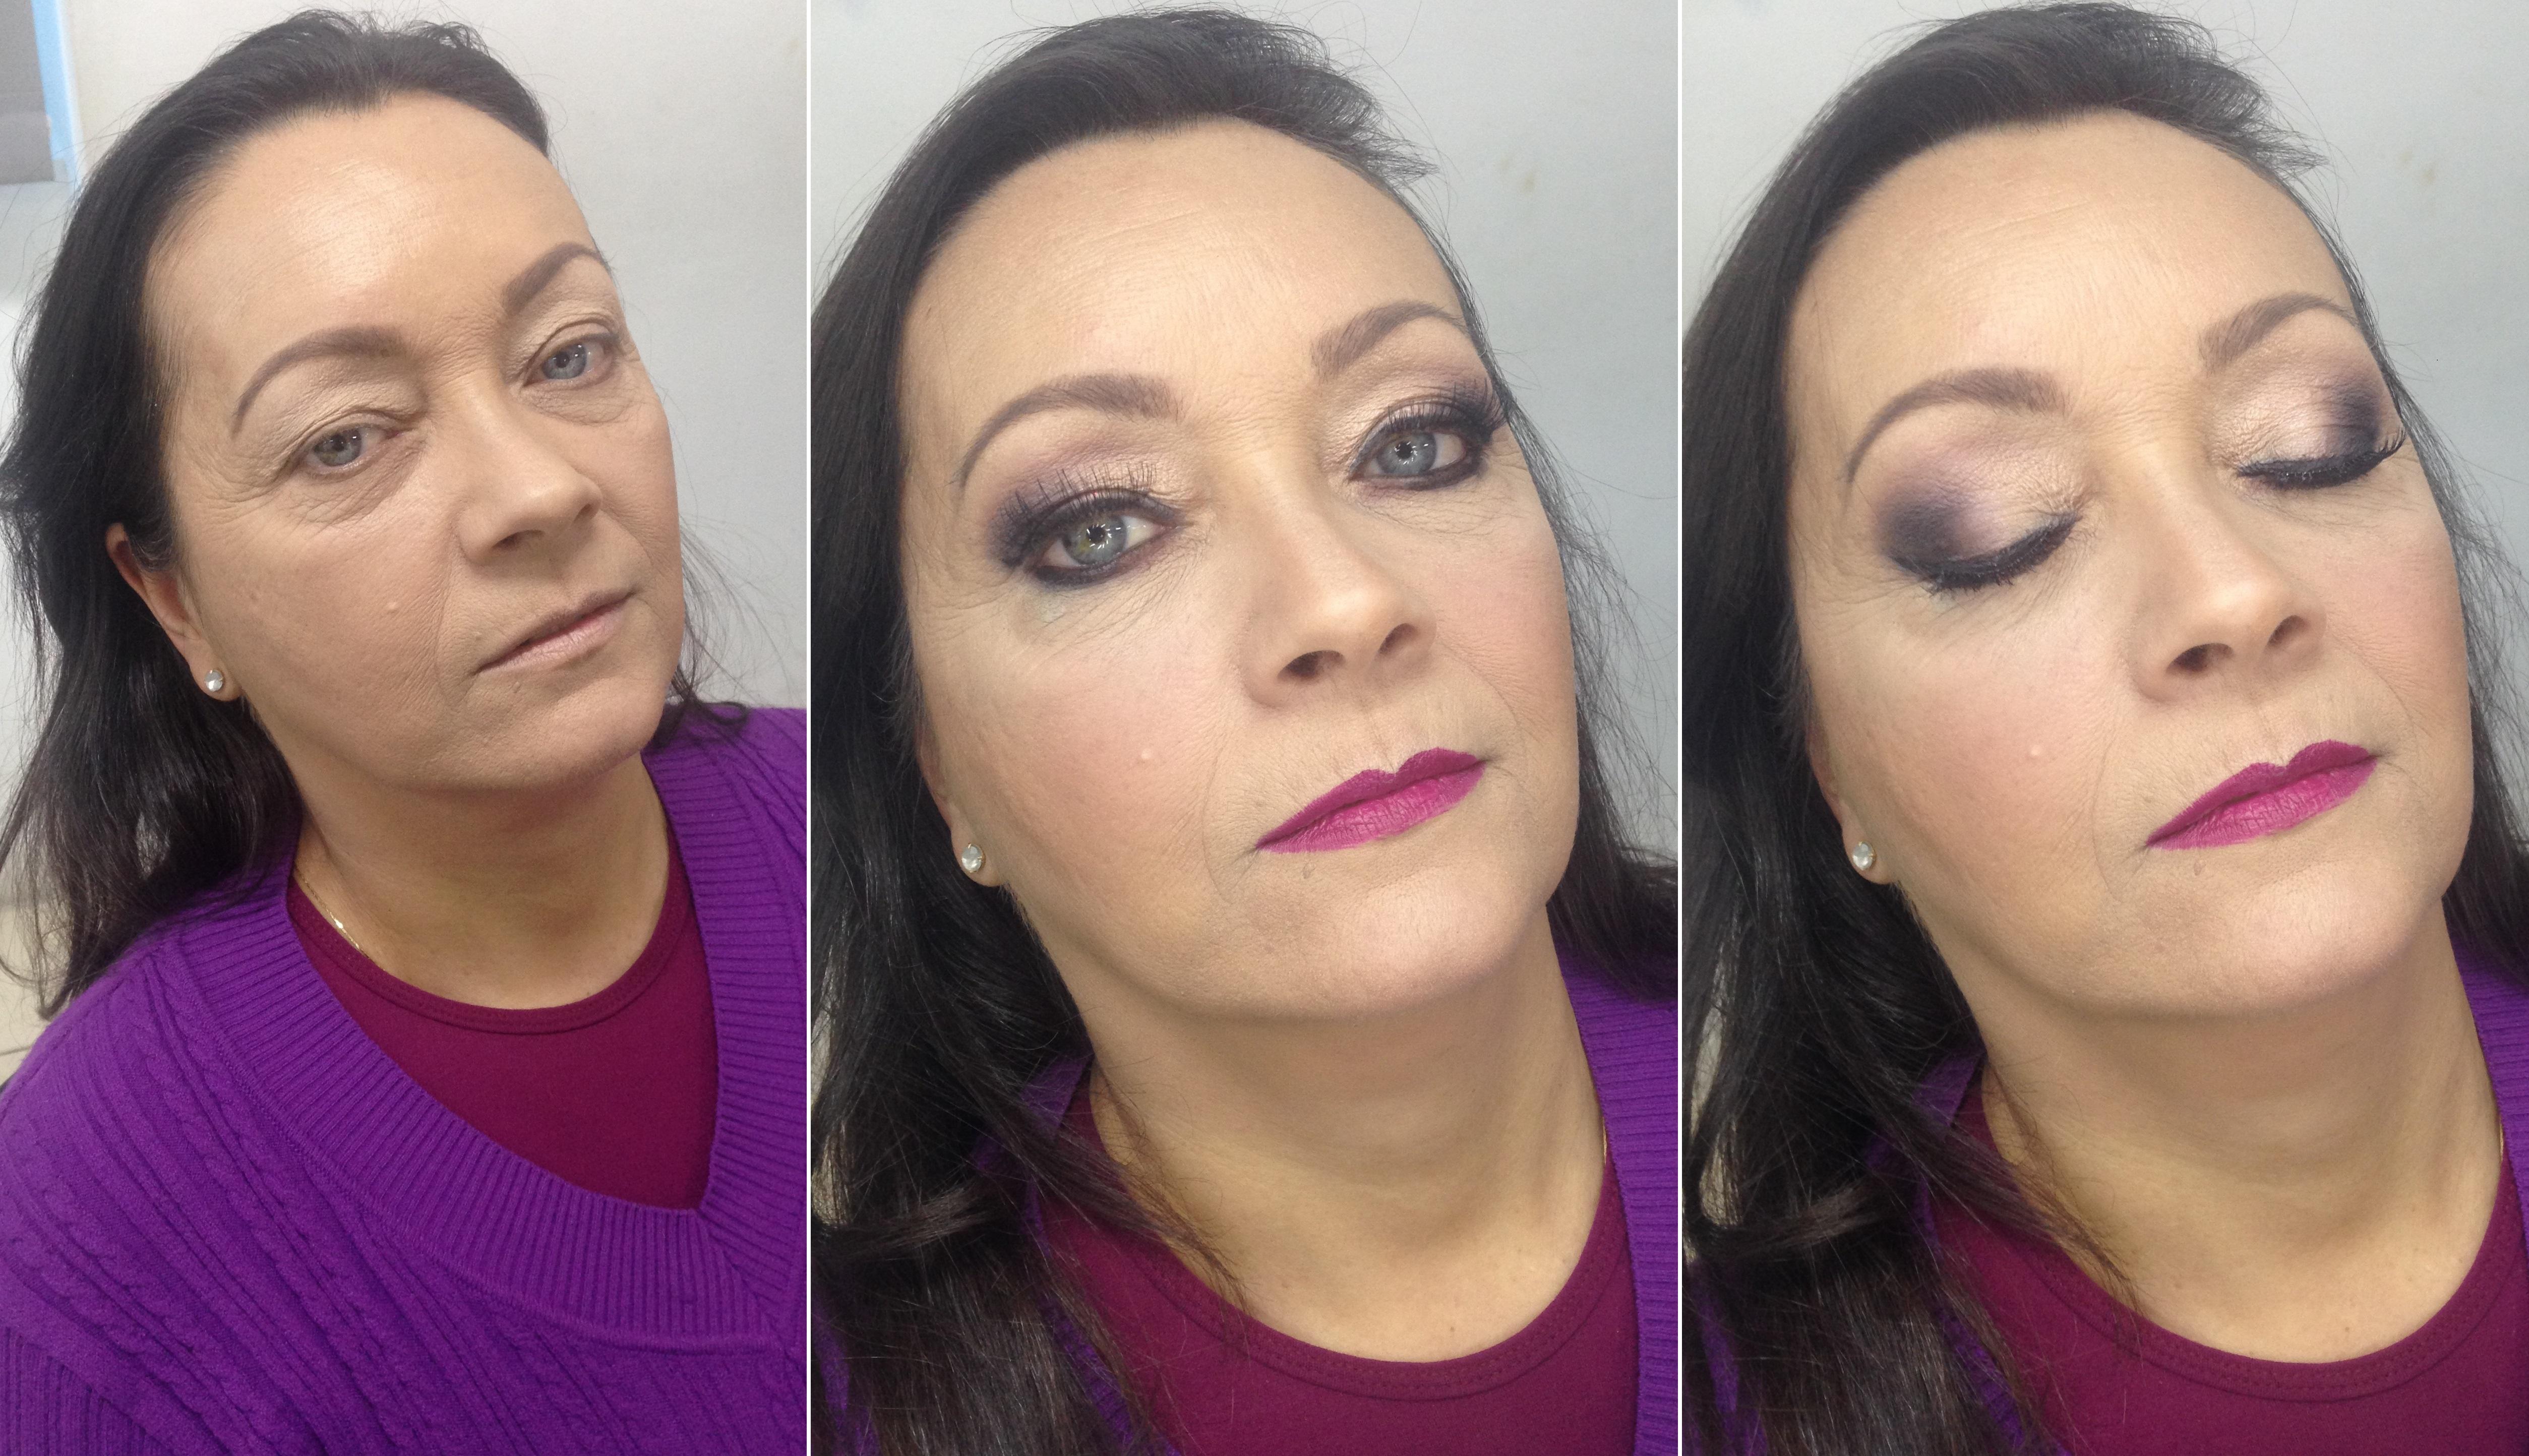 Maquiagem pele madura, esfumado na diagonal - Instagram @geisamedeirosmakeup #MakeUp #InstaMake #Maquiagem #MaquiagemDeFesta #MaquiagemProfissional #MaquiagemSocial #MaquiagemNoiva #GeisaMedeirosMakeUp #PPF #PausaParaFeminices #Vult #VultCosmética #Bitarra #MaryKay #RubyRose #Luisance #Dailus #QuemDisseBerenice #Contém1g #Morphe #PincéisMacrilan #LuFerraes #Mac maquiagem maquiador(a) designer de sobrancelhas